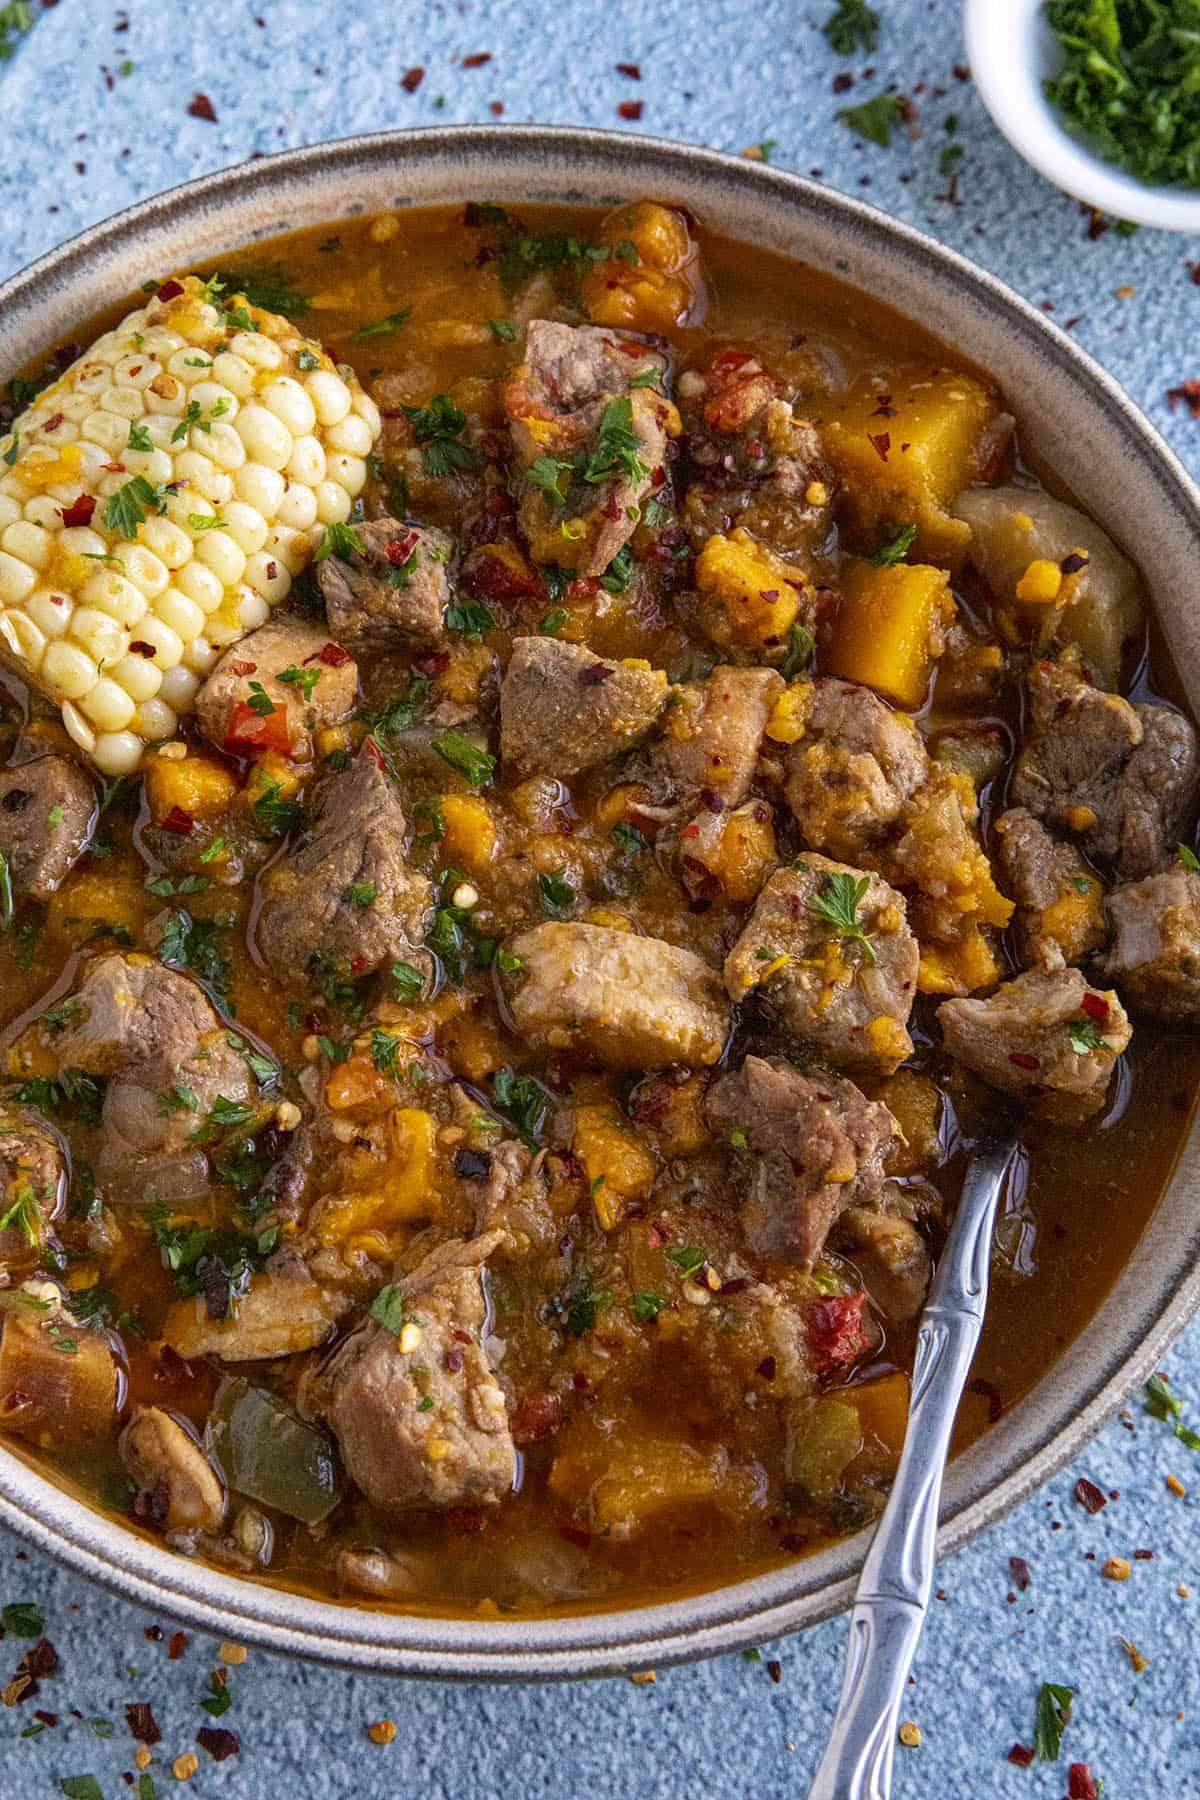 Sancocho (Latin American Stew)